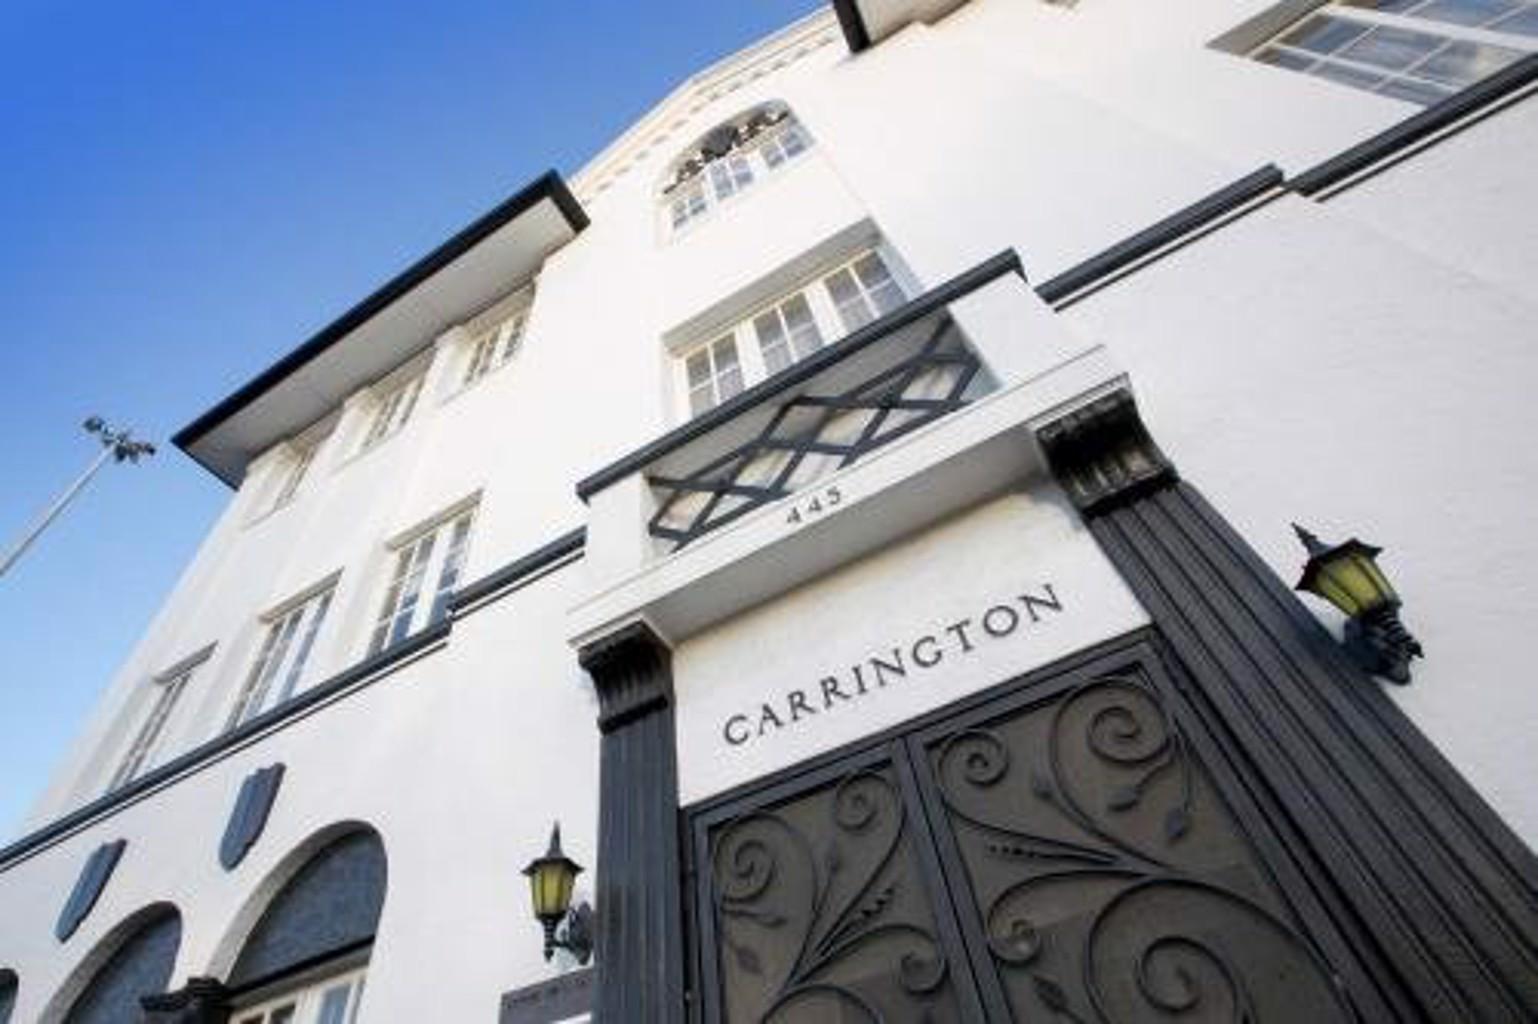 Carrington Manor